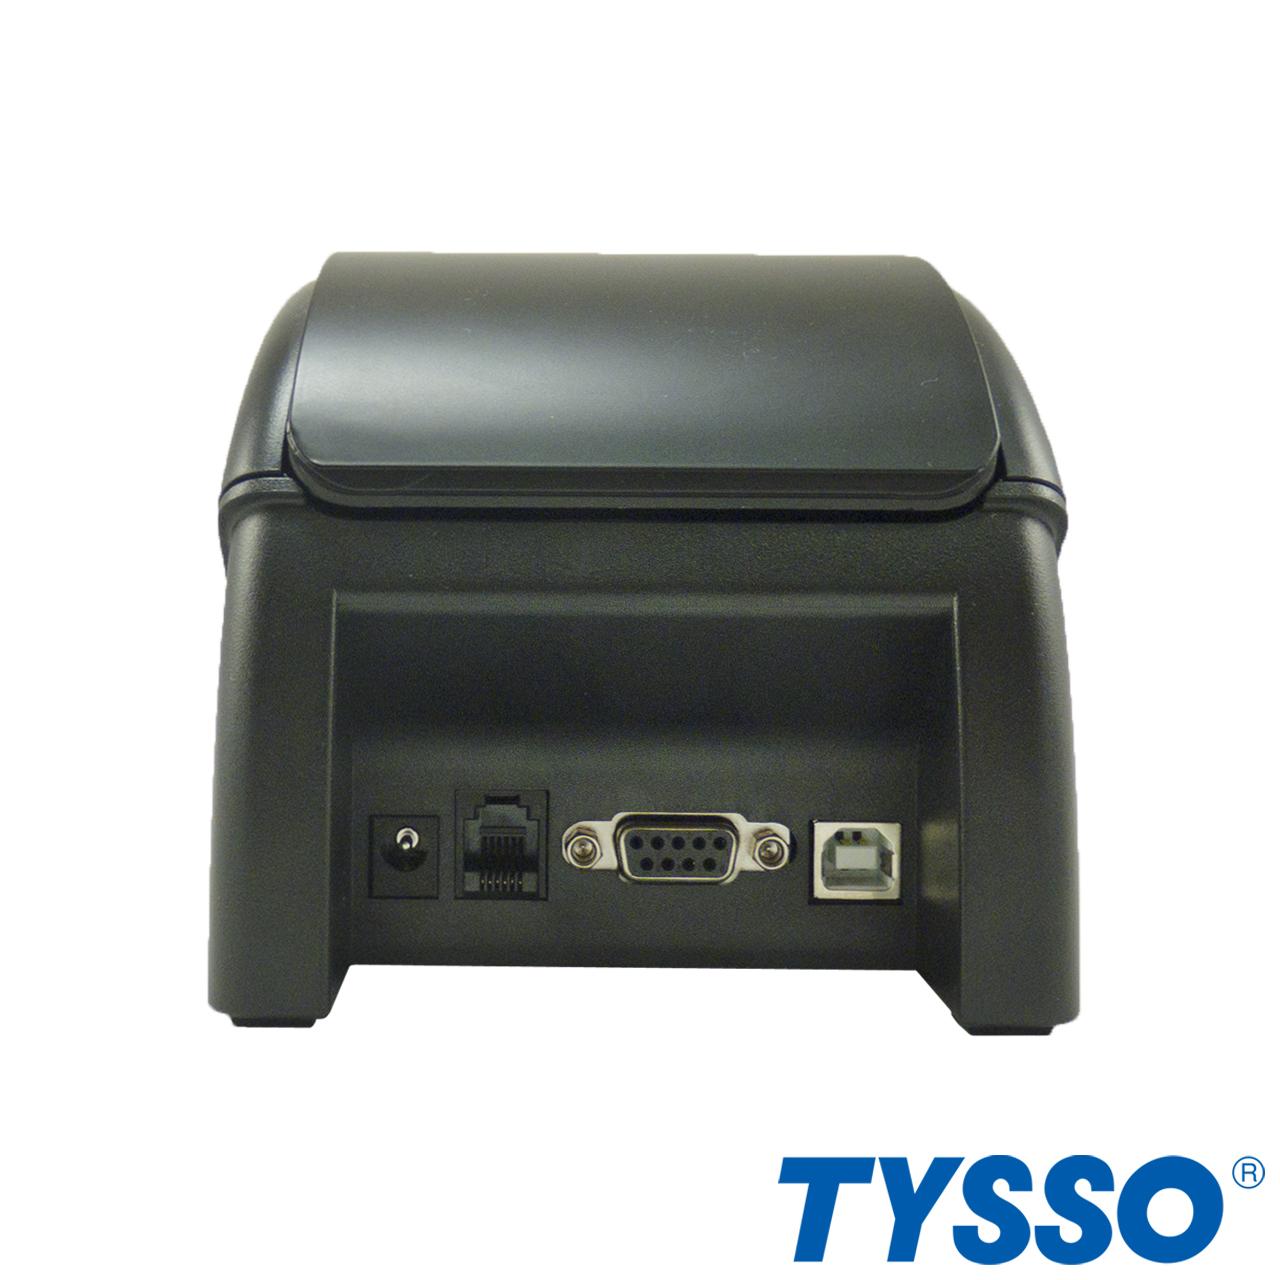 Taiwan 58mm Thermal Receipt Printer   FAMETECH INC